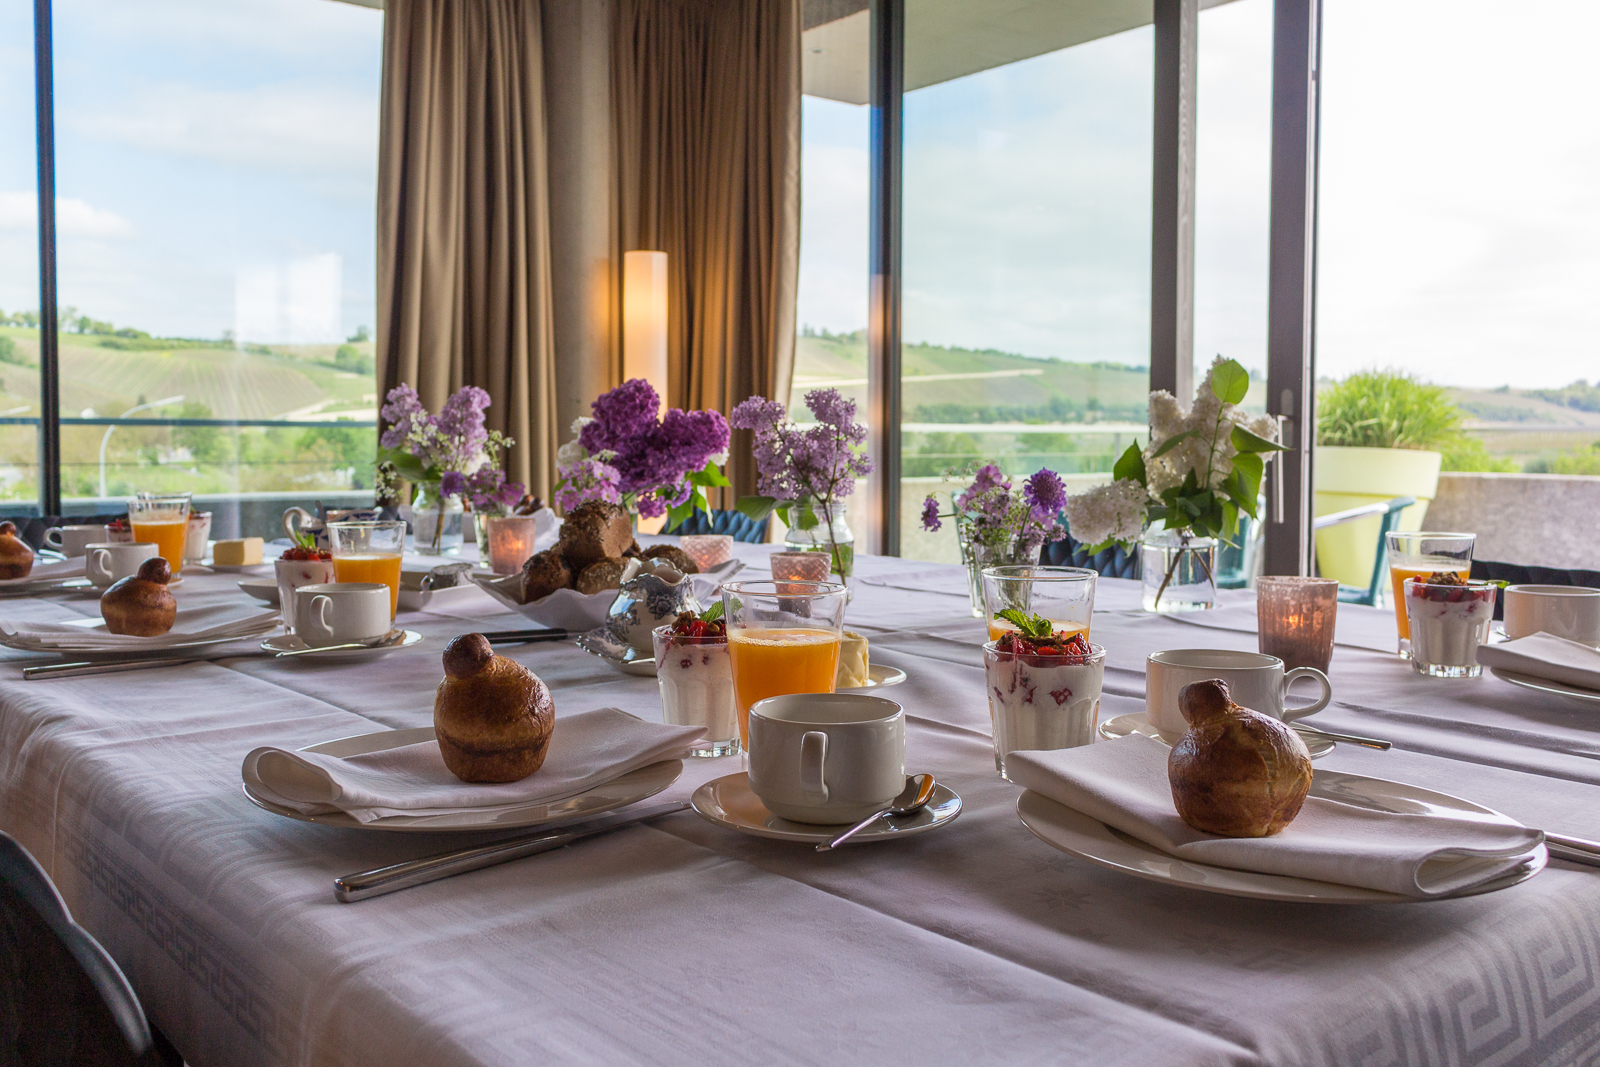 Hotel Ecluse, Luxemburg, Luxembourg, Mosel, luxemburgische Mosel, Wein, Genuss, Kulinarik, Moselle